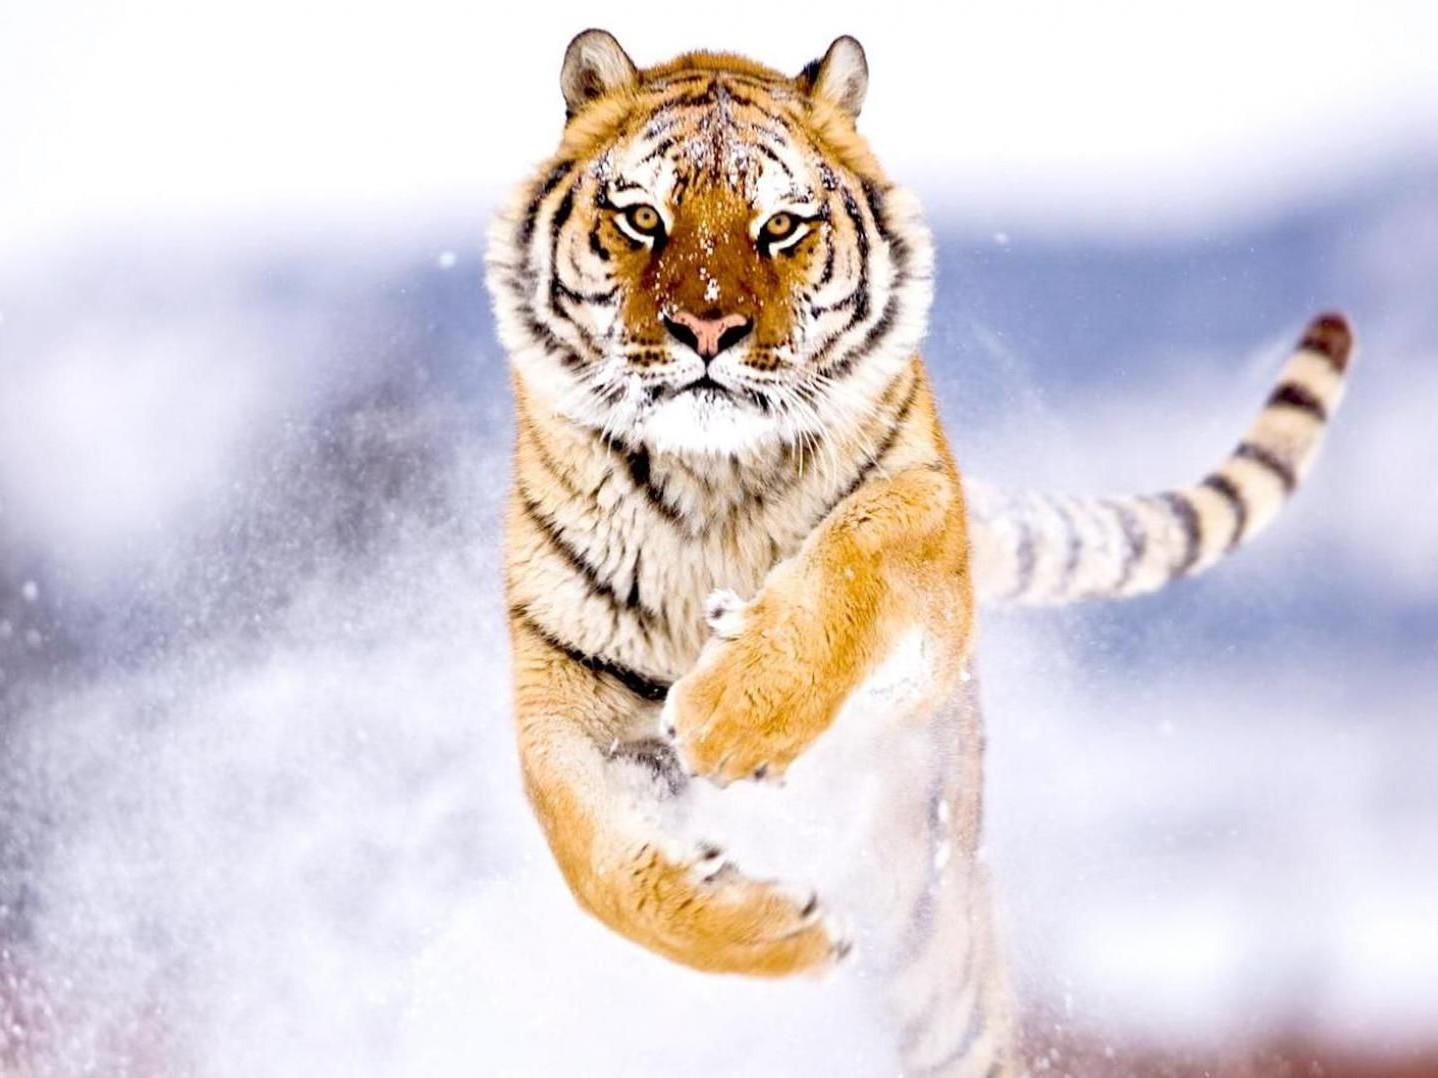 siberian_tiger-e1408870546707